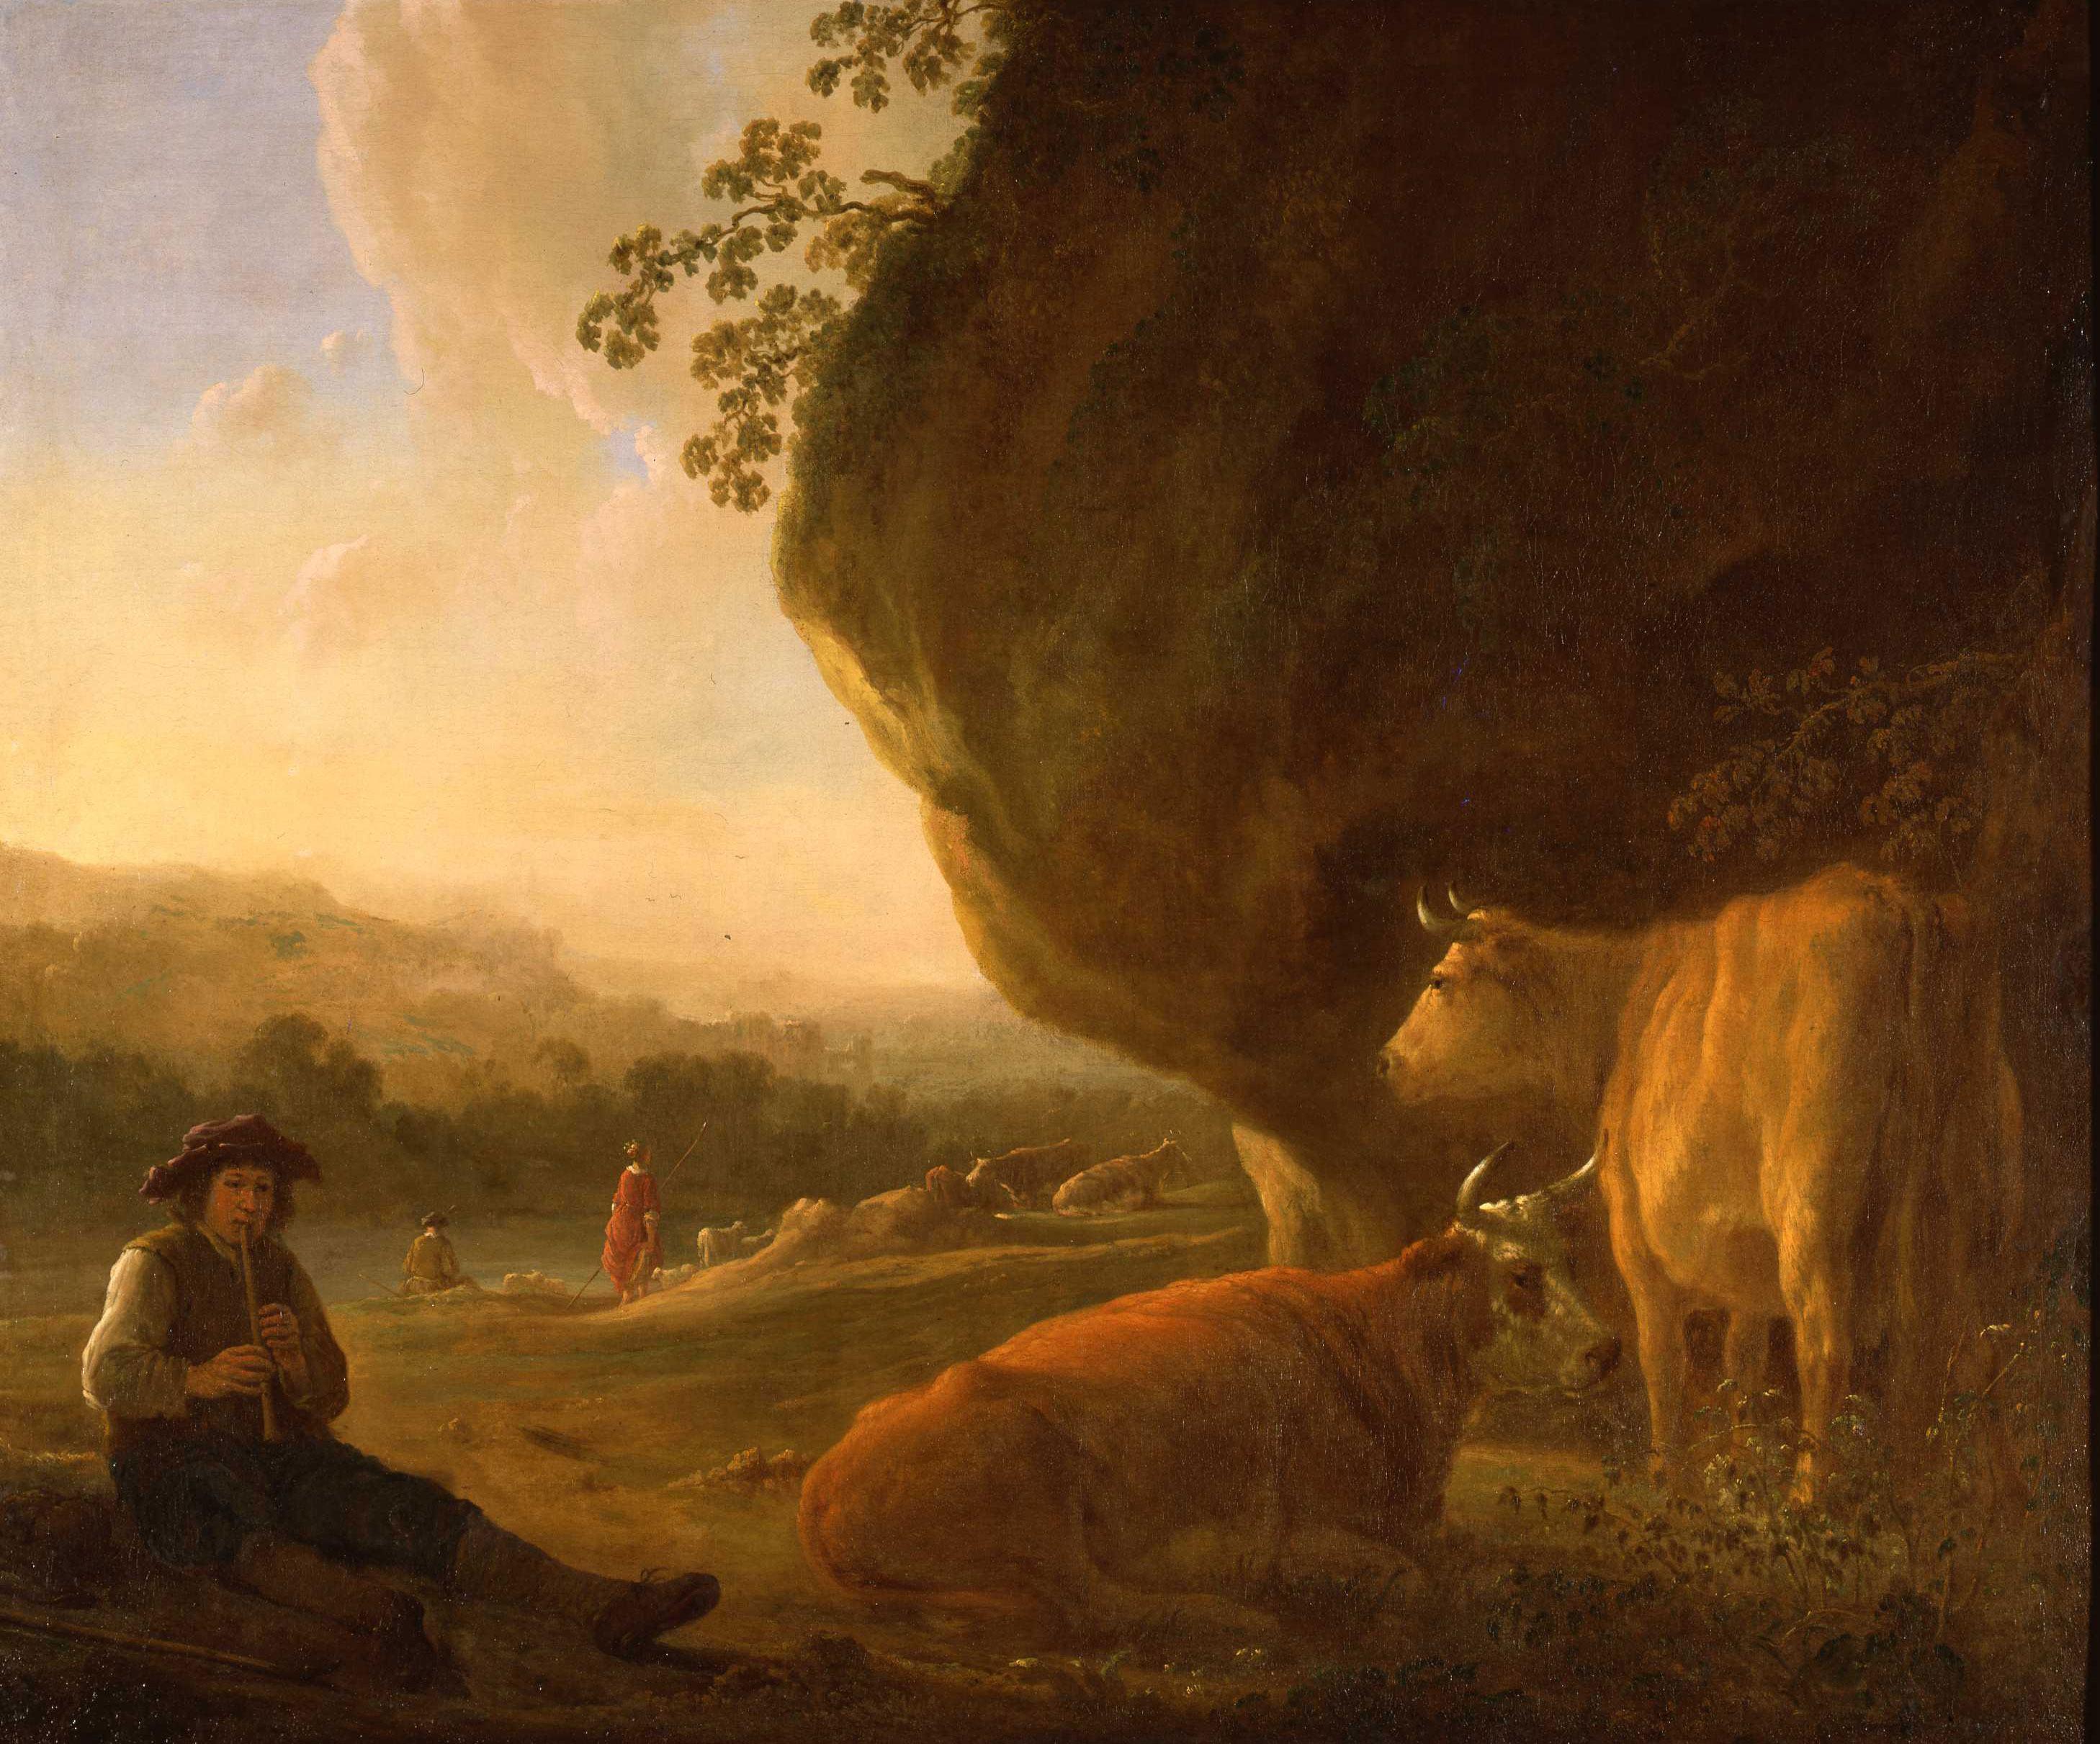 Aelbert Jacobsz Cuyp, (1620-1691), <em>Landscape with a Shepherd Playing Flute</em>, ca. 1645 Dordrechts Museum, Dordrecht